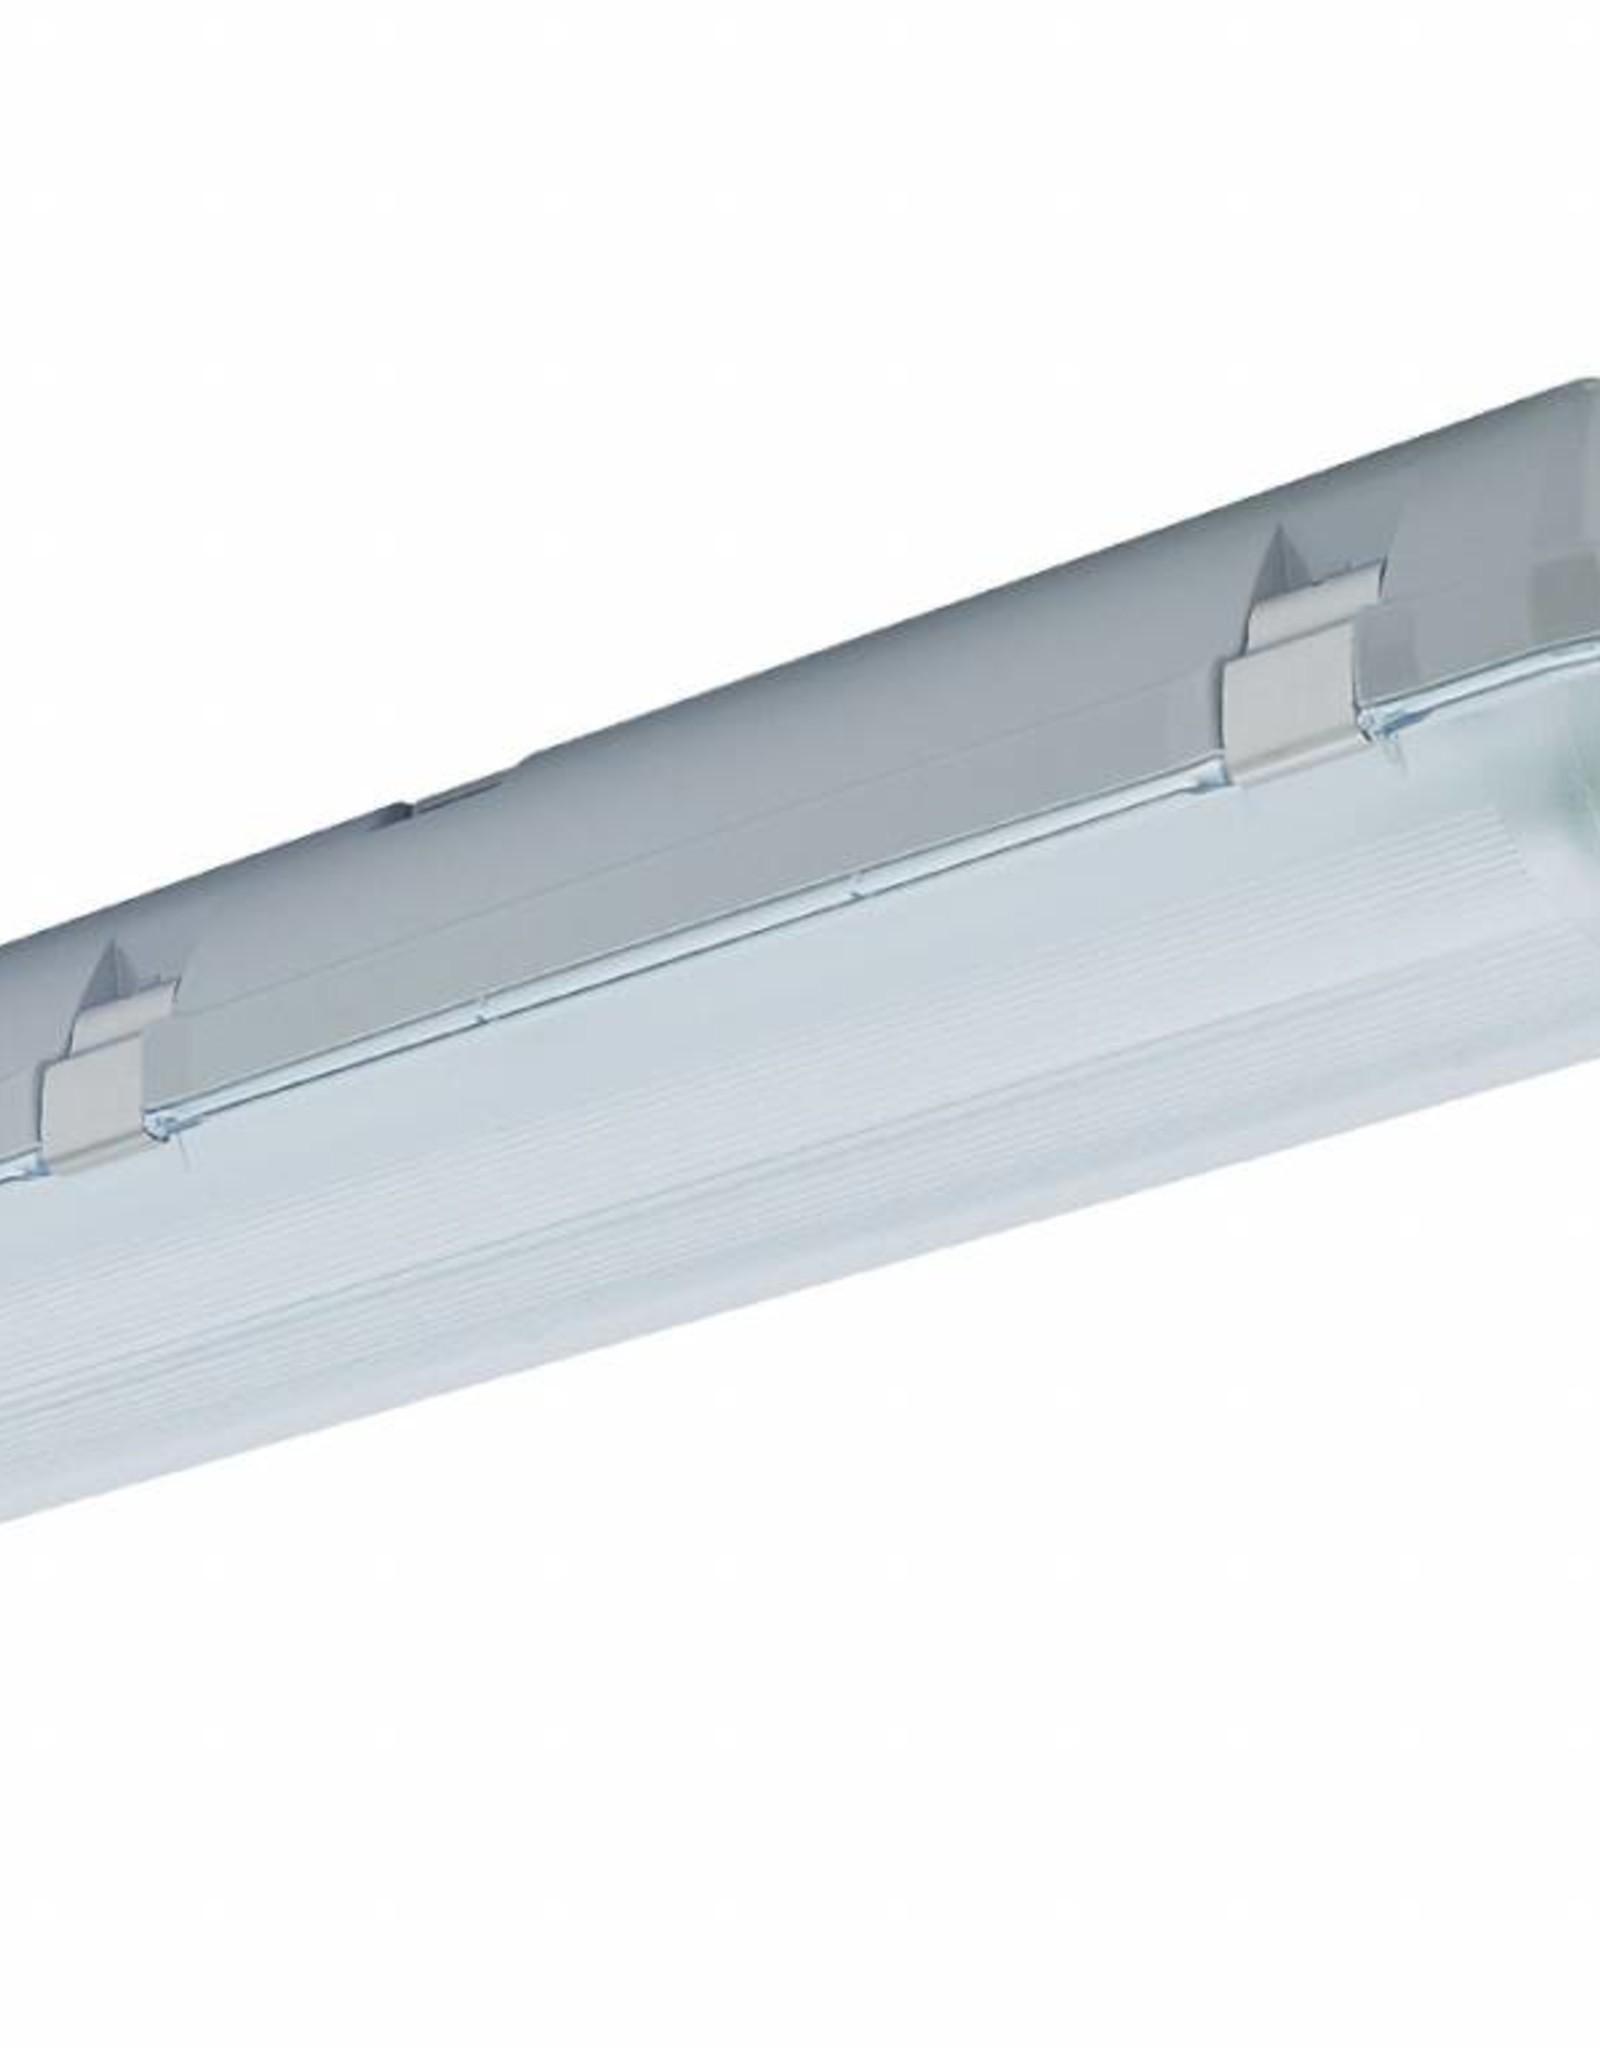 Prima 1x80W HO - ABS - inox clips - HF ballast